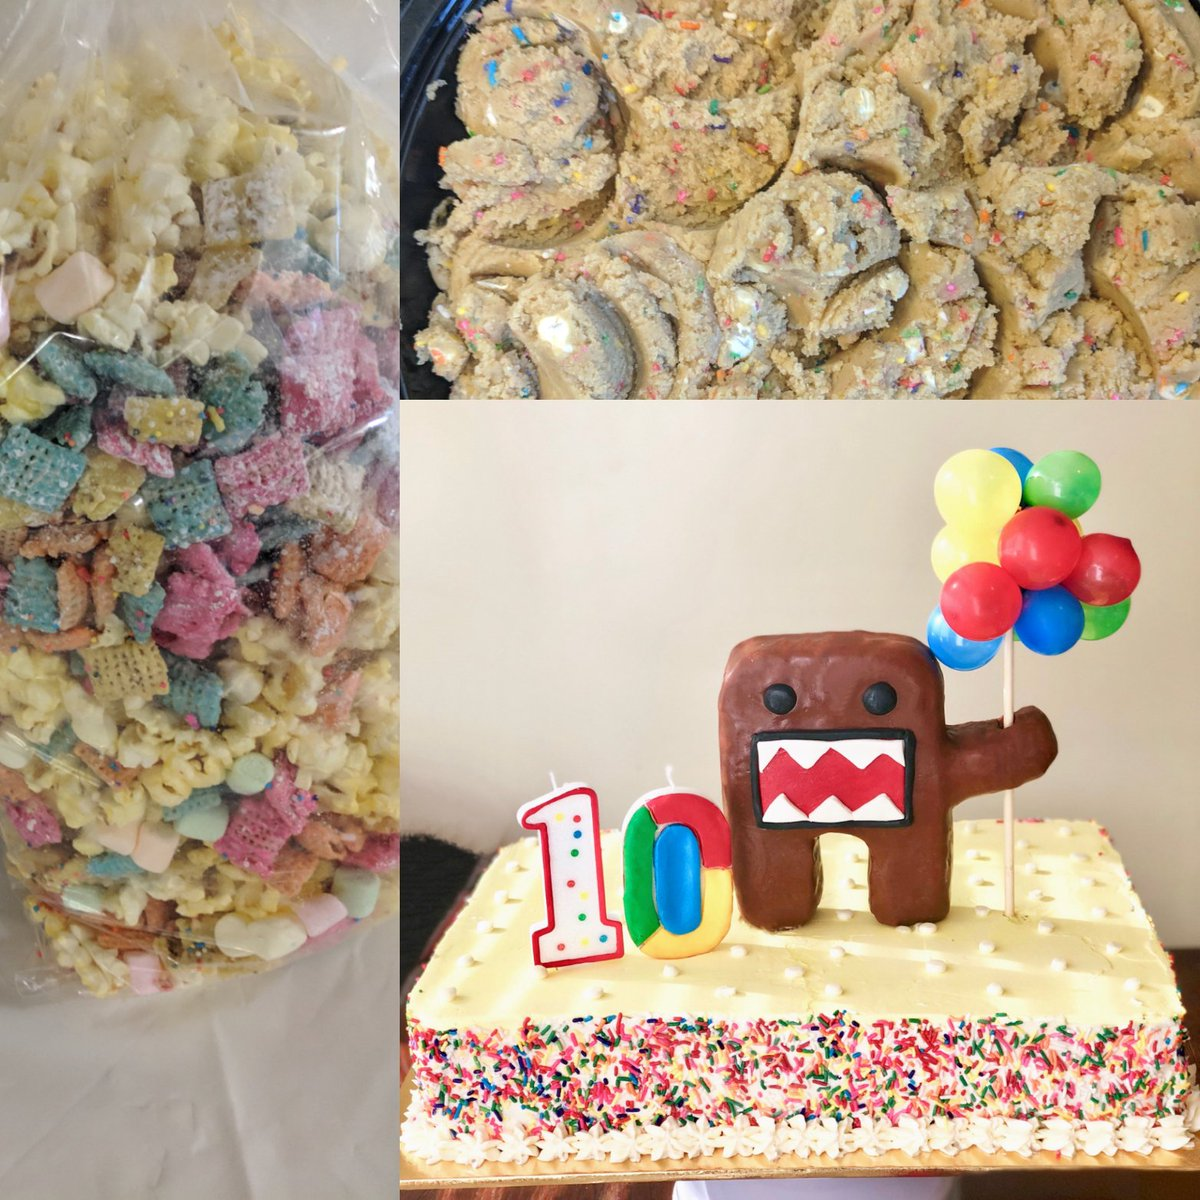 Wondrous Julie Parent On Twitter Funfetti Overload Happy 10Th Birthday Funny Birthday Cards Online Alyptdamsfinfo